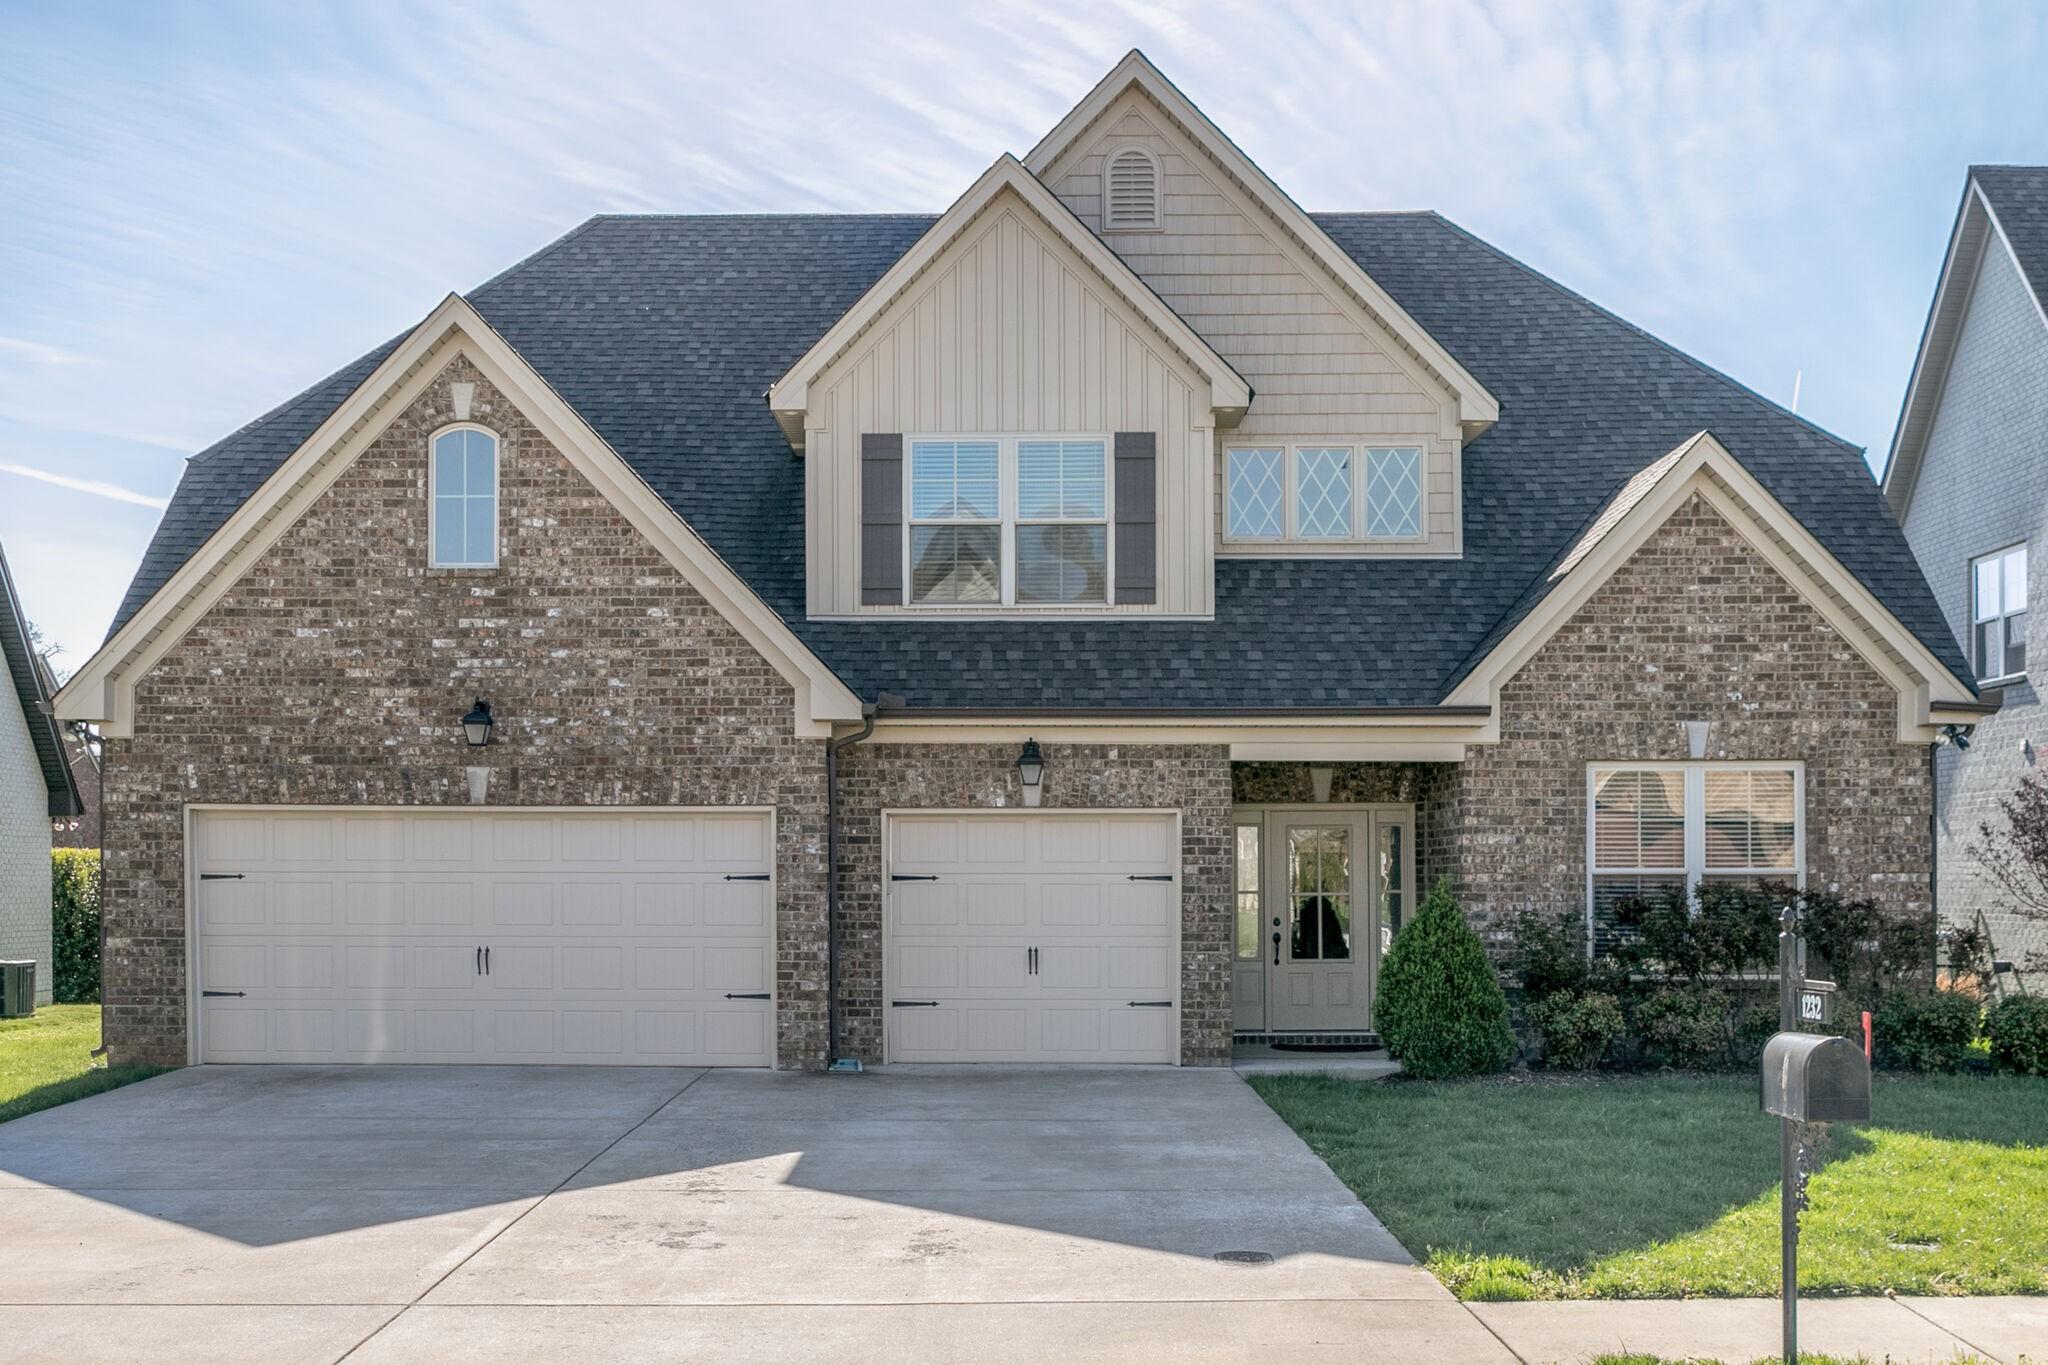 1232 Hensfield Dr Property Photo - Murfreesboro, TN real estate listing